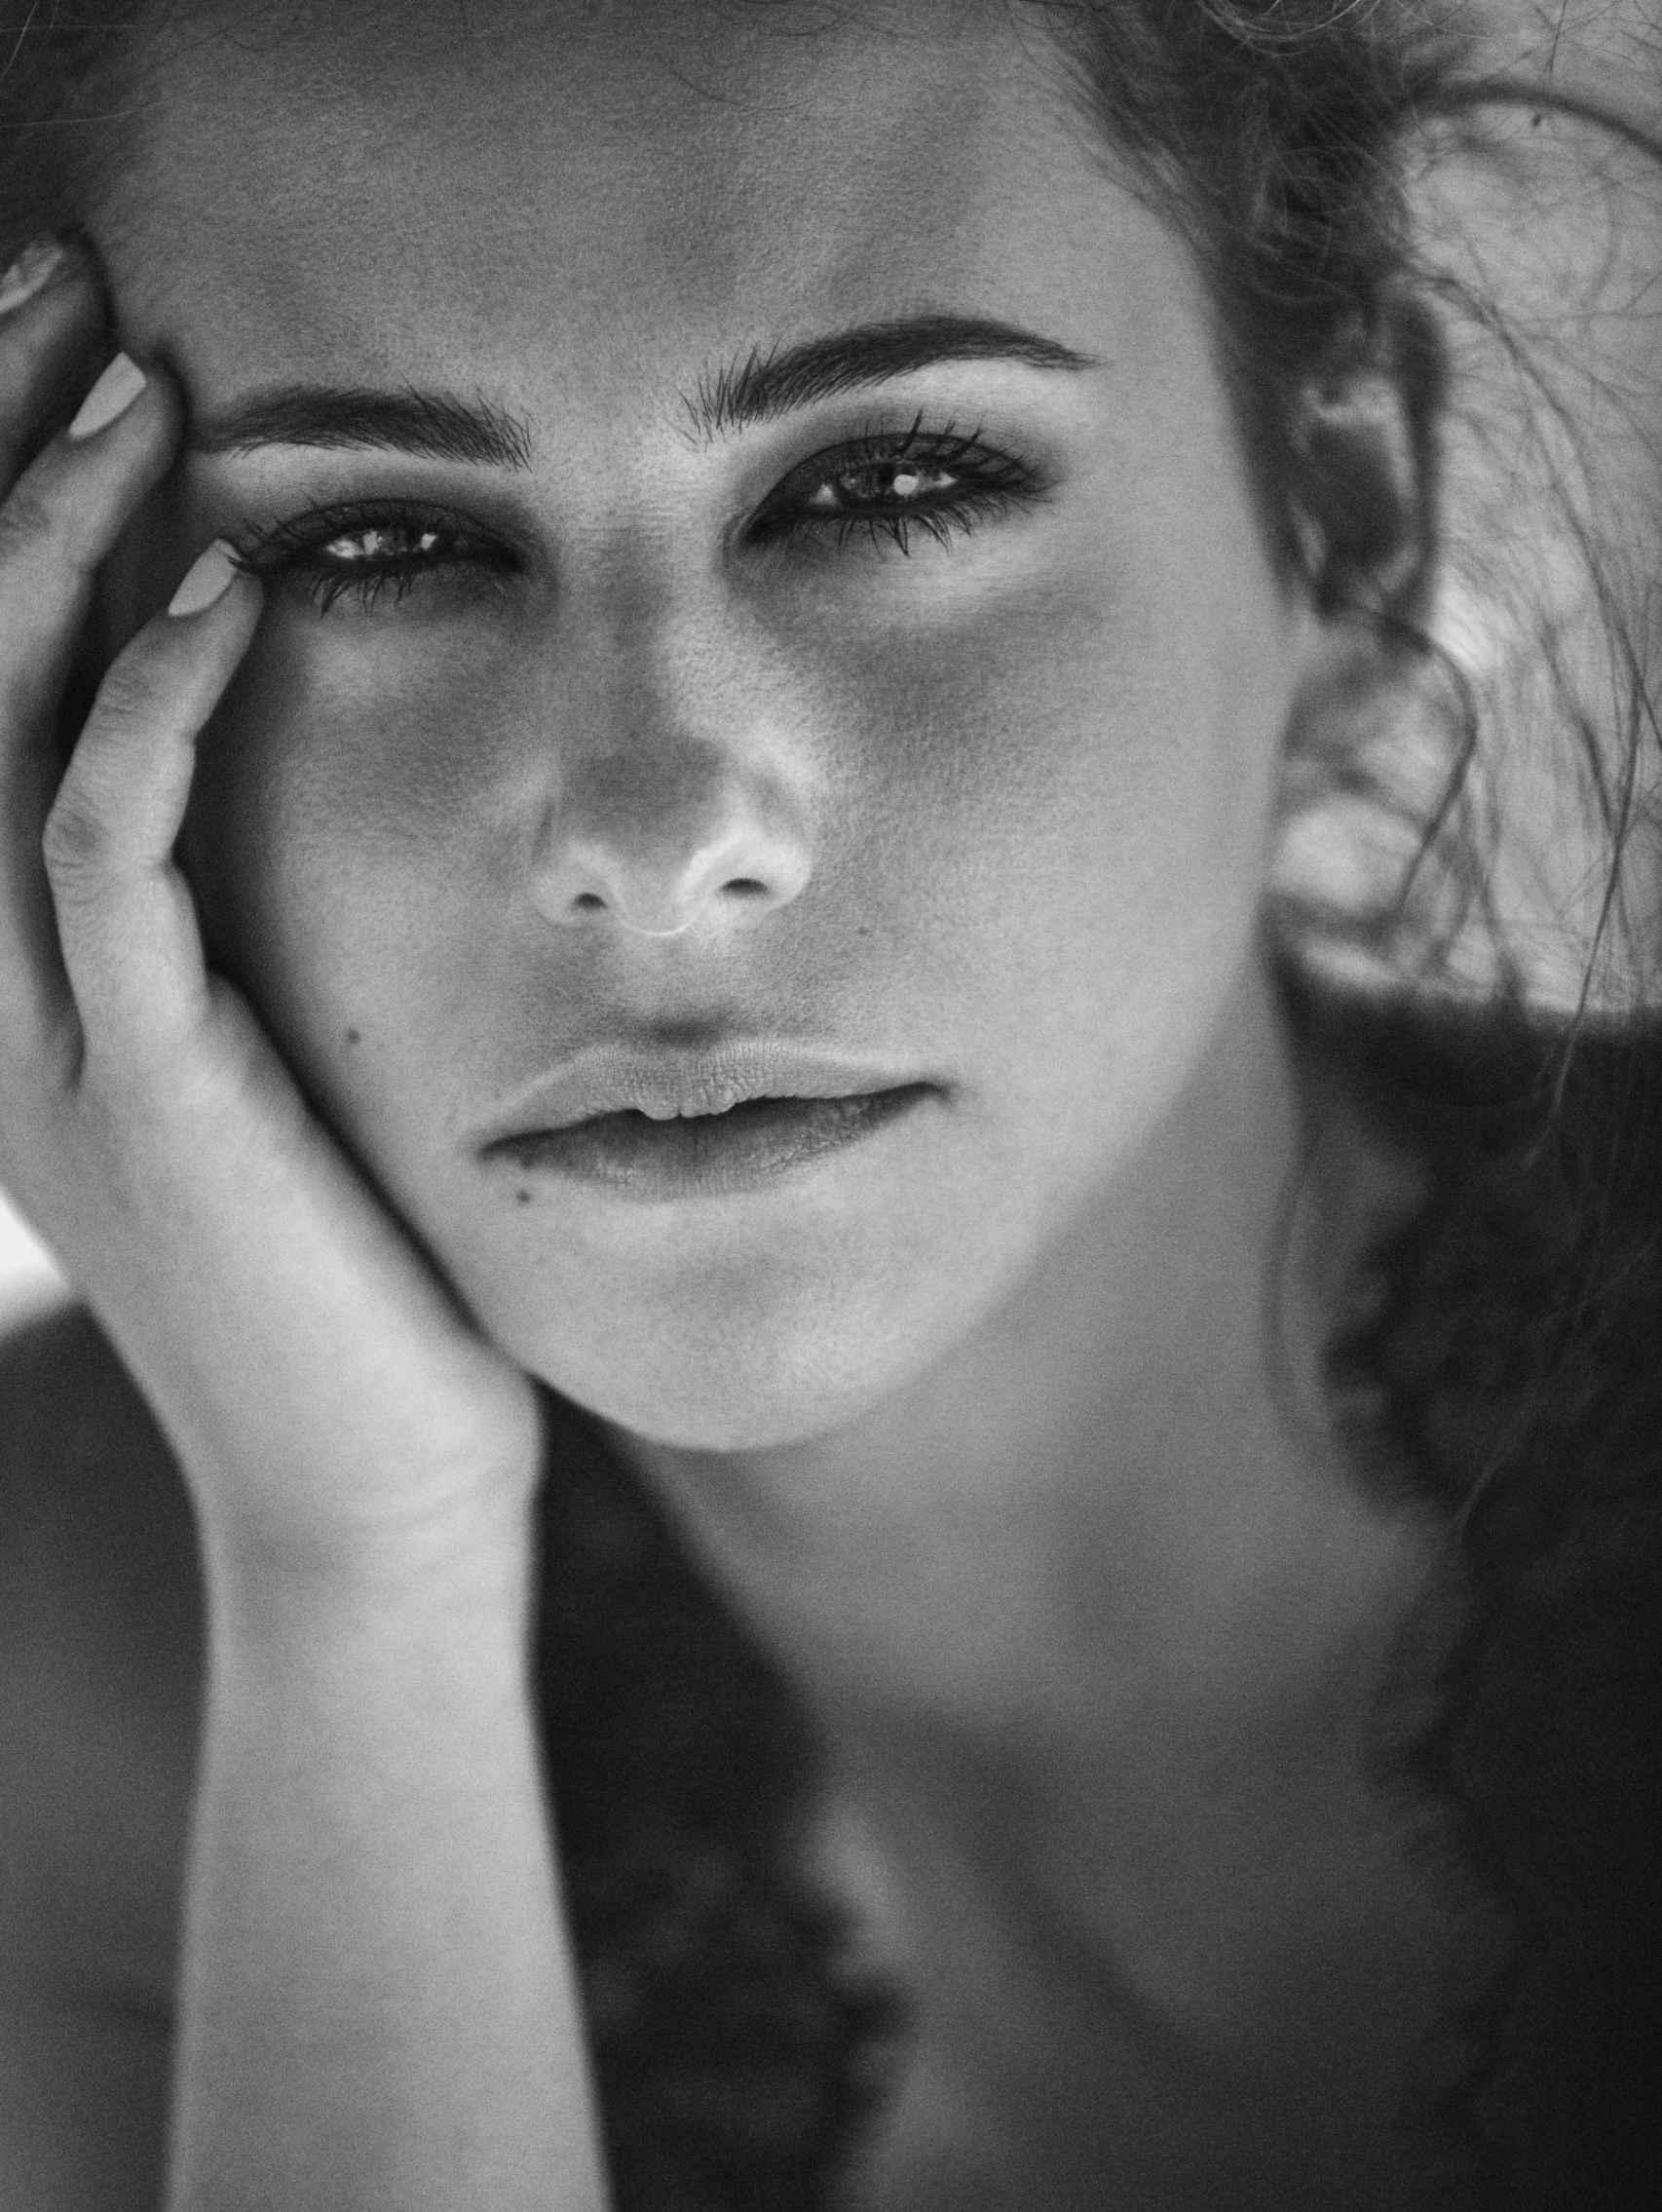 La actriz Irene Escolar, futuro de la escena española.